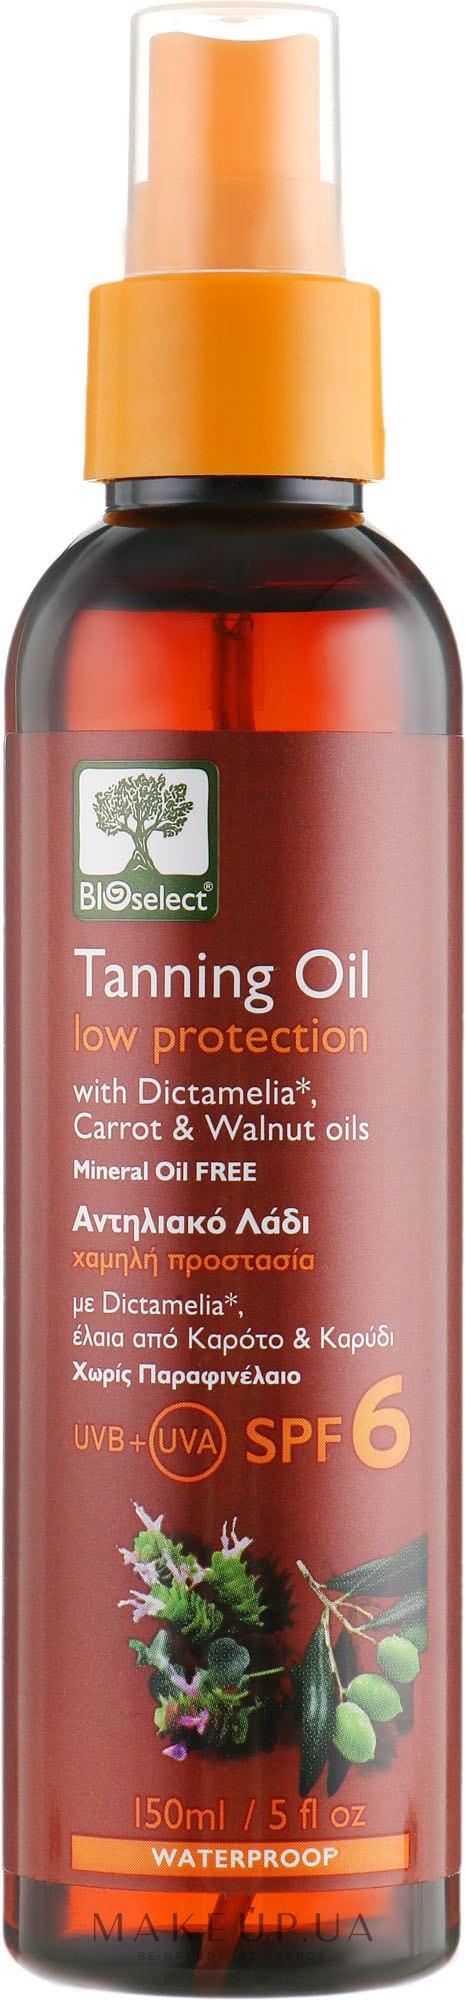 Солнцезащитное масло для загара - Bioselect Tanning Oil Low Protection SPF6 — фото 150ml